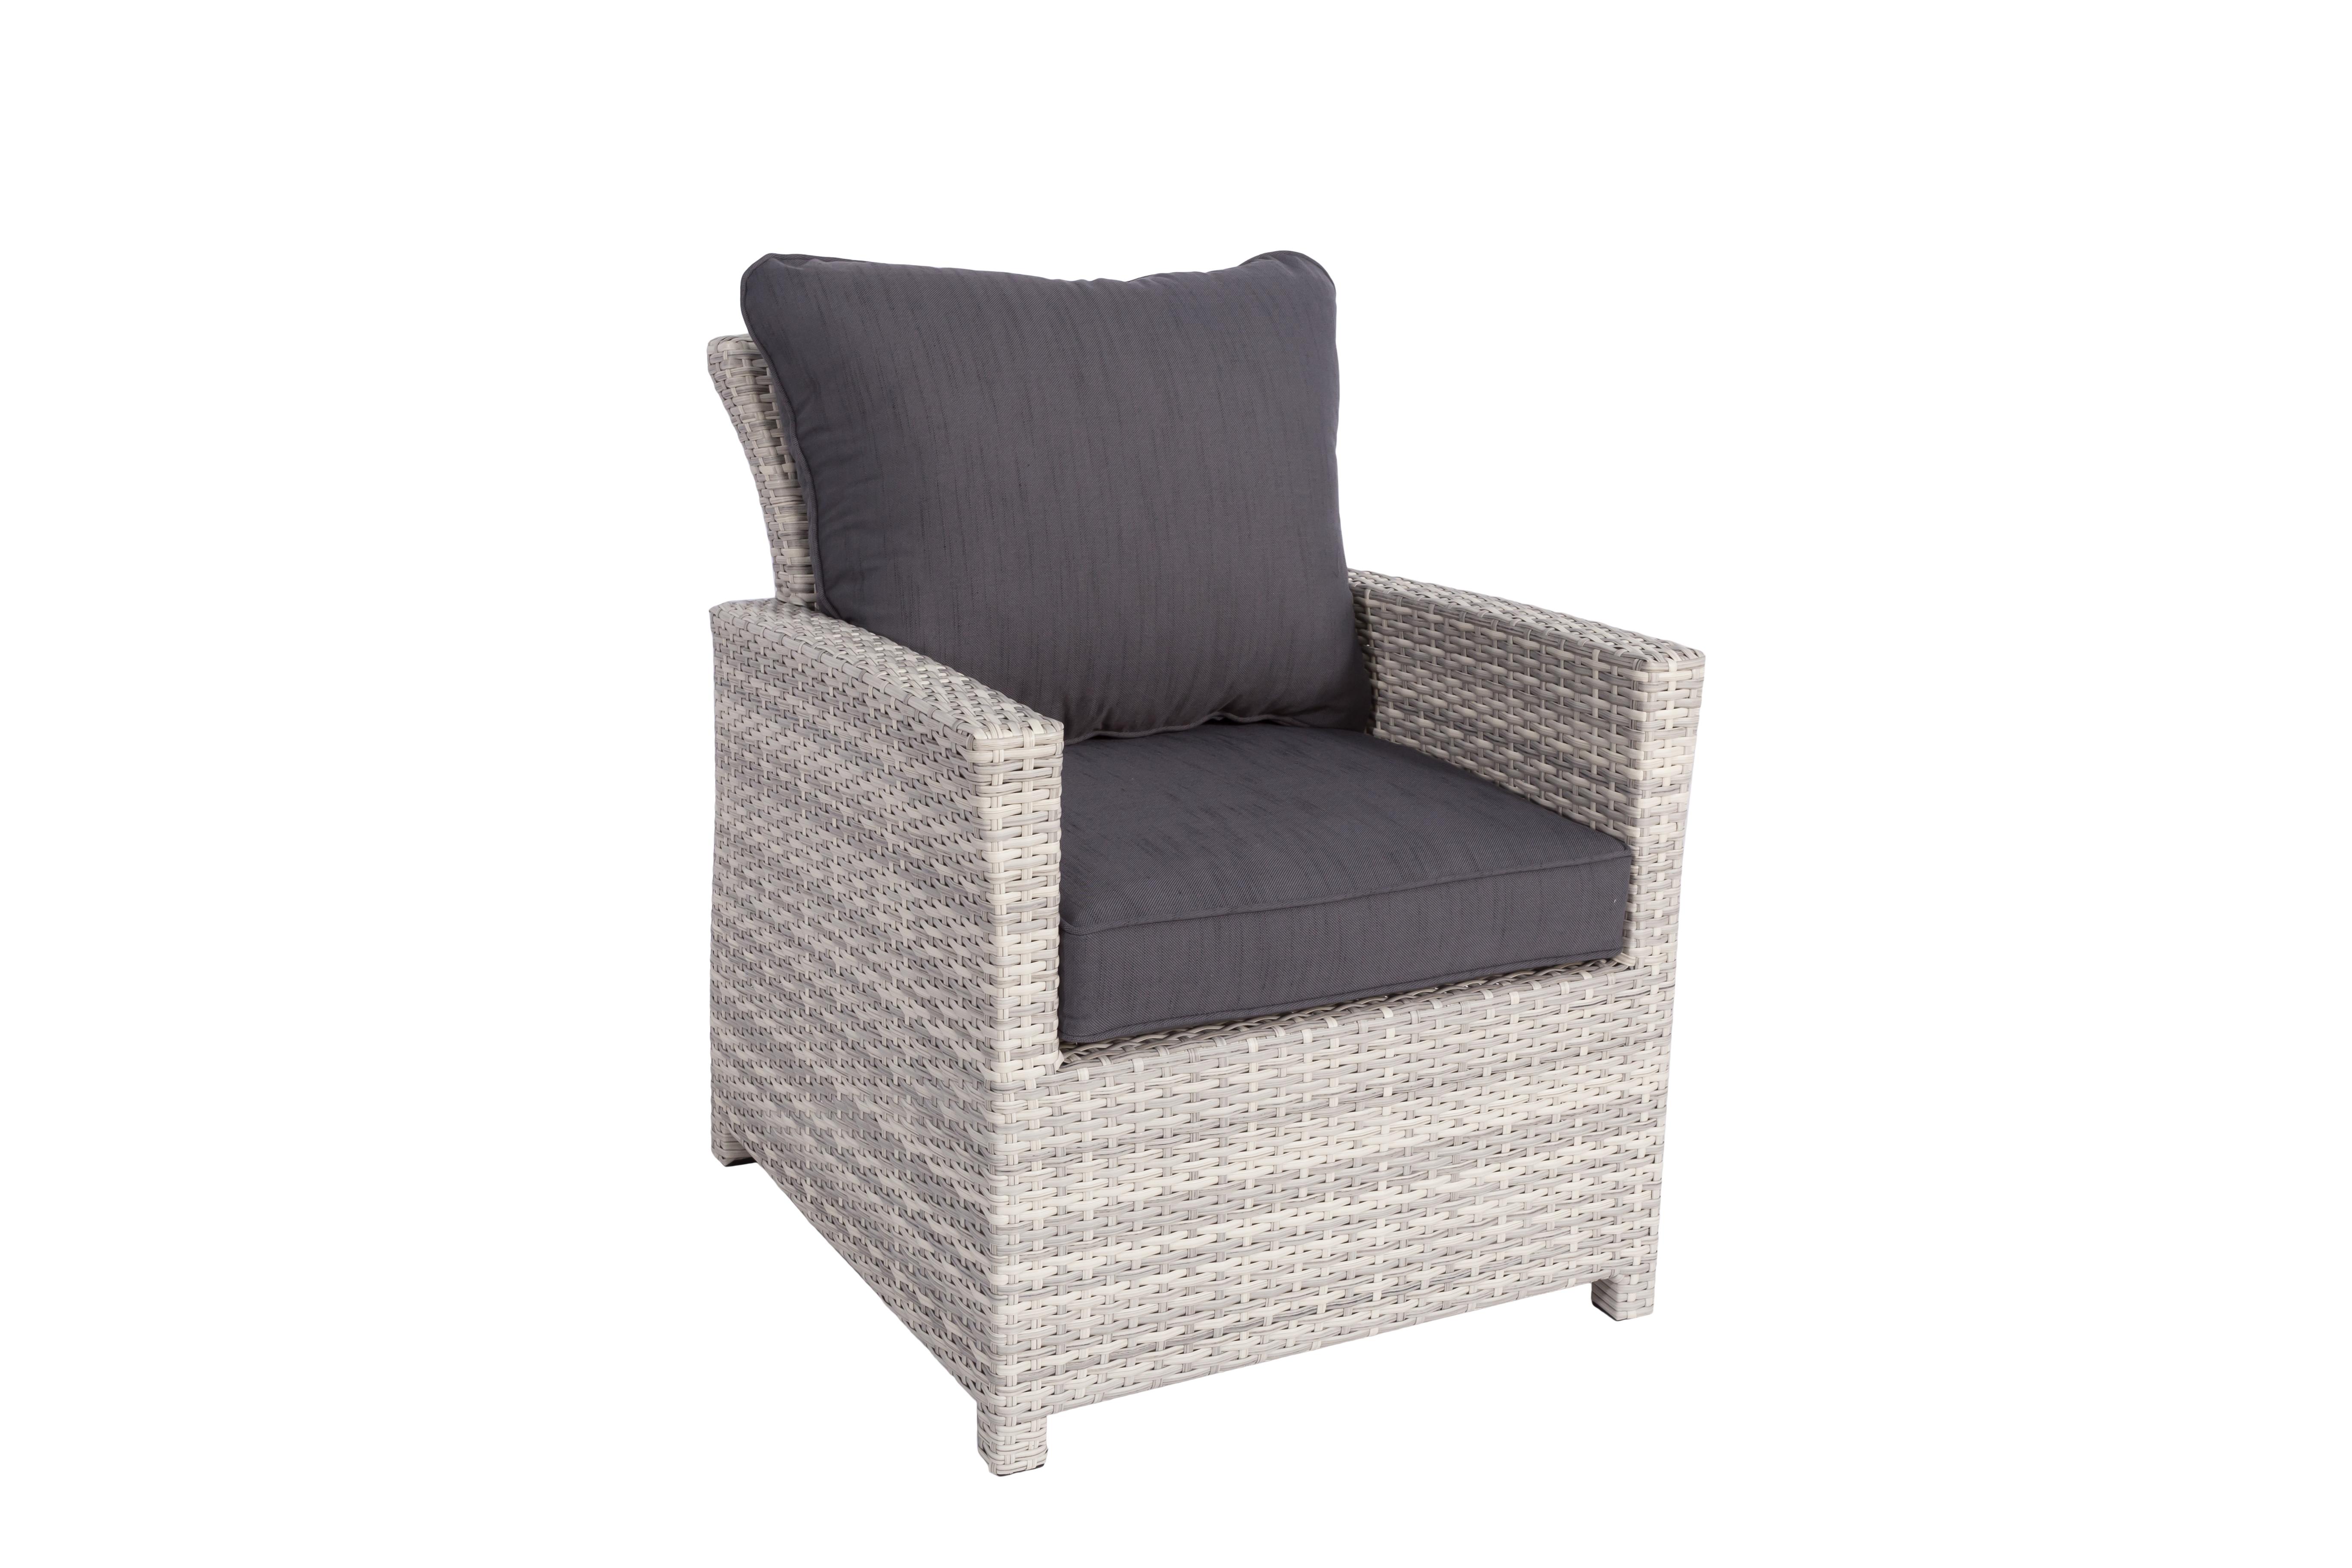 parla xl polyrattan ecklounge gartenm bel set wei grau lounge m bel garten. Black Bedroom Furniture Sets. Home Design Ideas